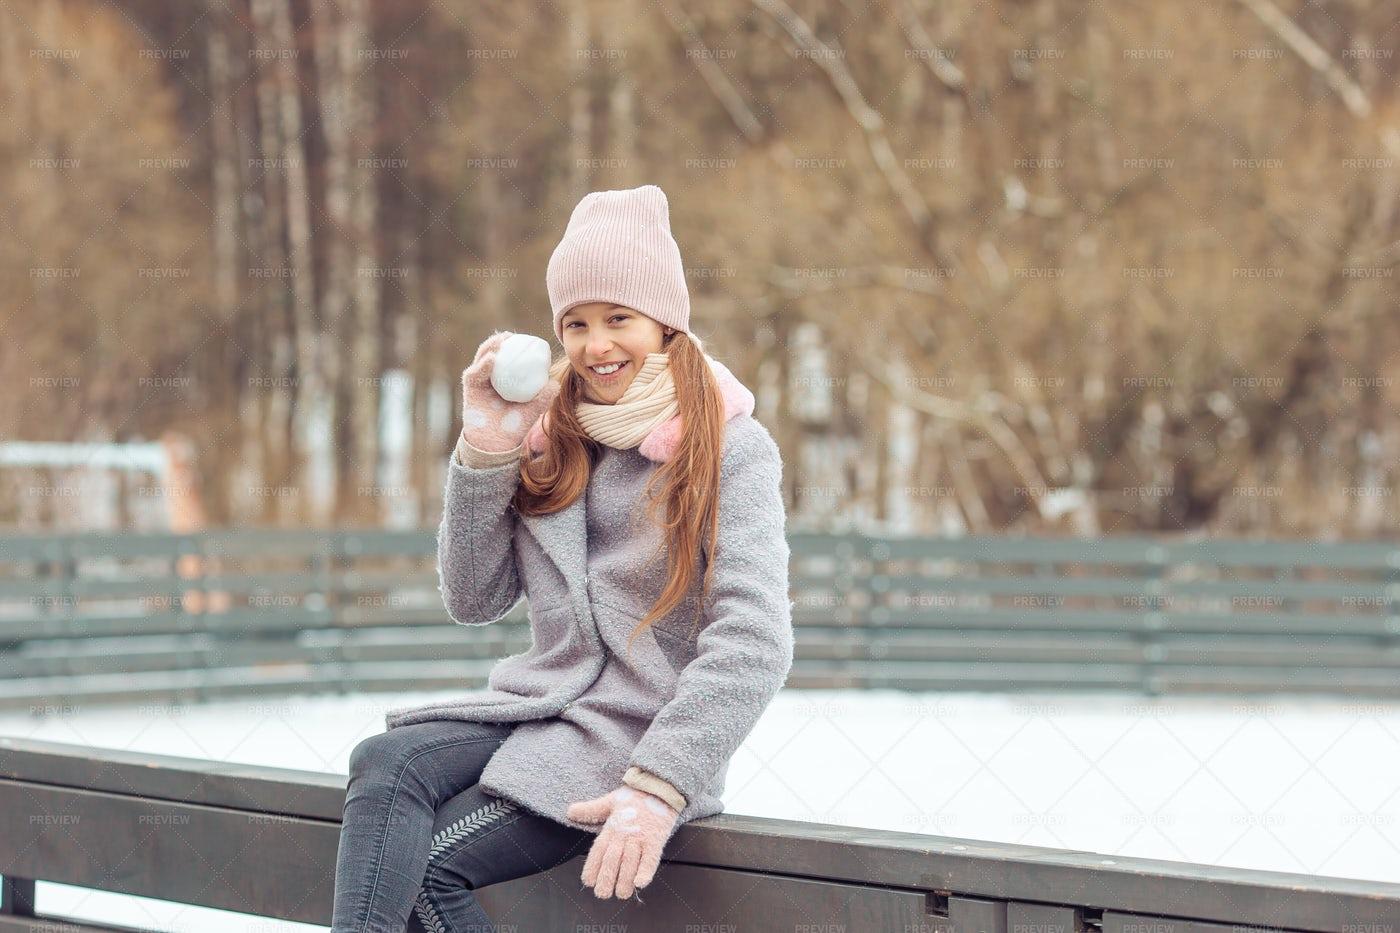 Little Girl With A Snowball: Stock Photos